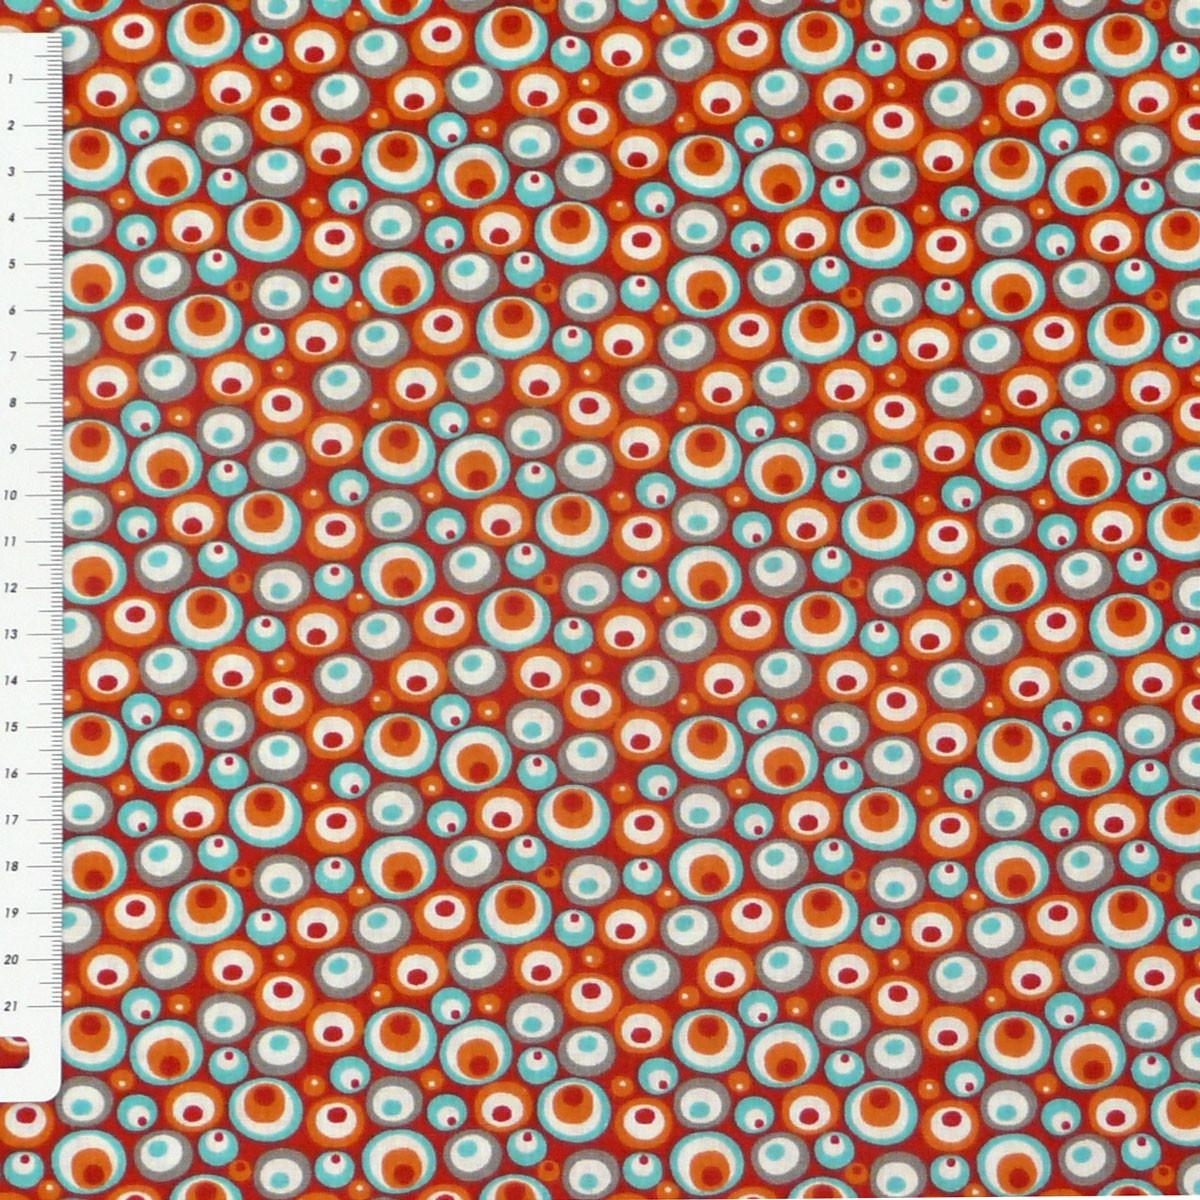 baumwollstoff stoff kreise rot orange t rkis grau wei alle stoffe stoffe gemustert stoff retro. Black Bedroom Furniture Sets. Home Design Ideas